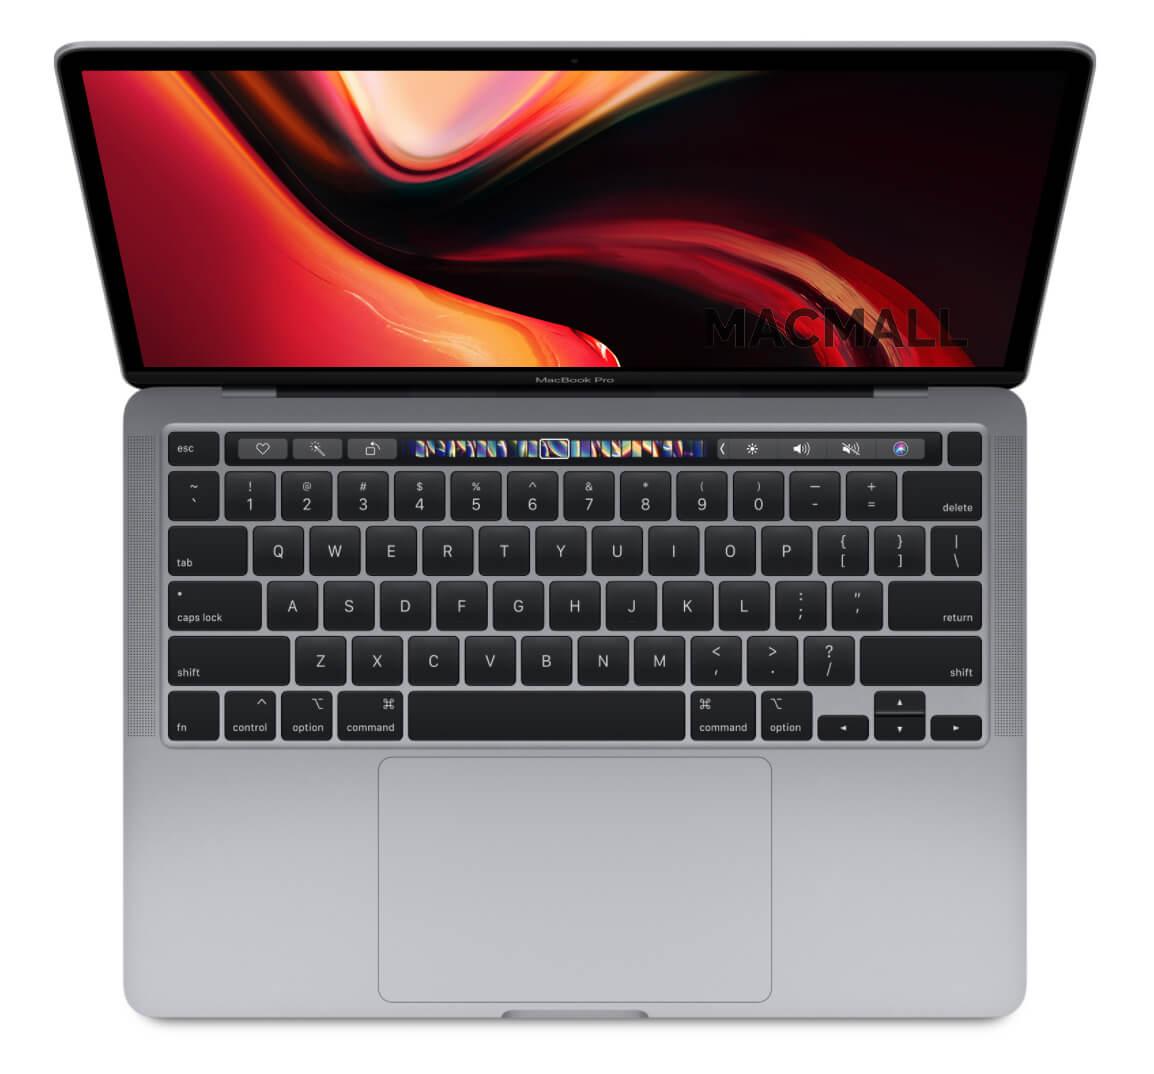 MacBook Pro M1 2020 MYD92 13-inch Space Gray 8GB / 512GB / GPU 8-core